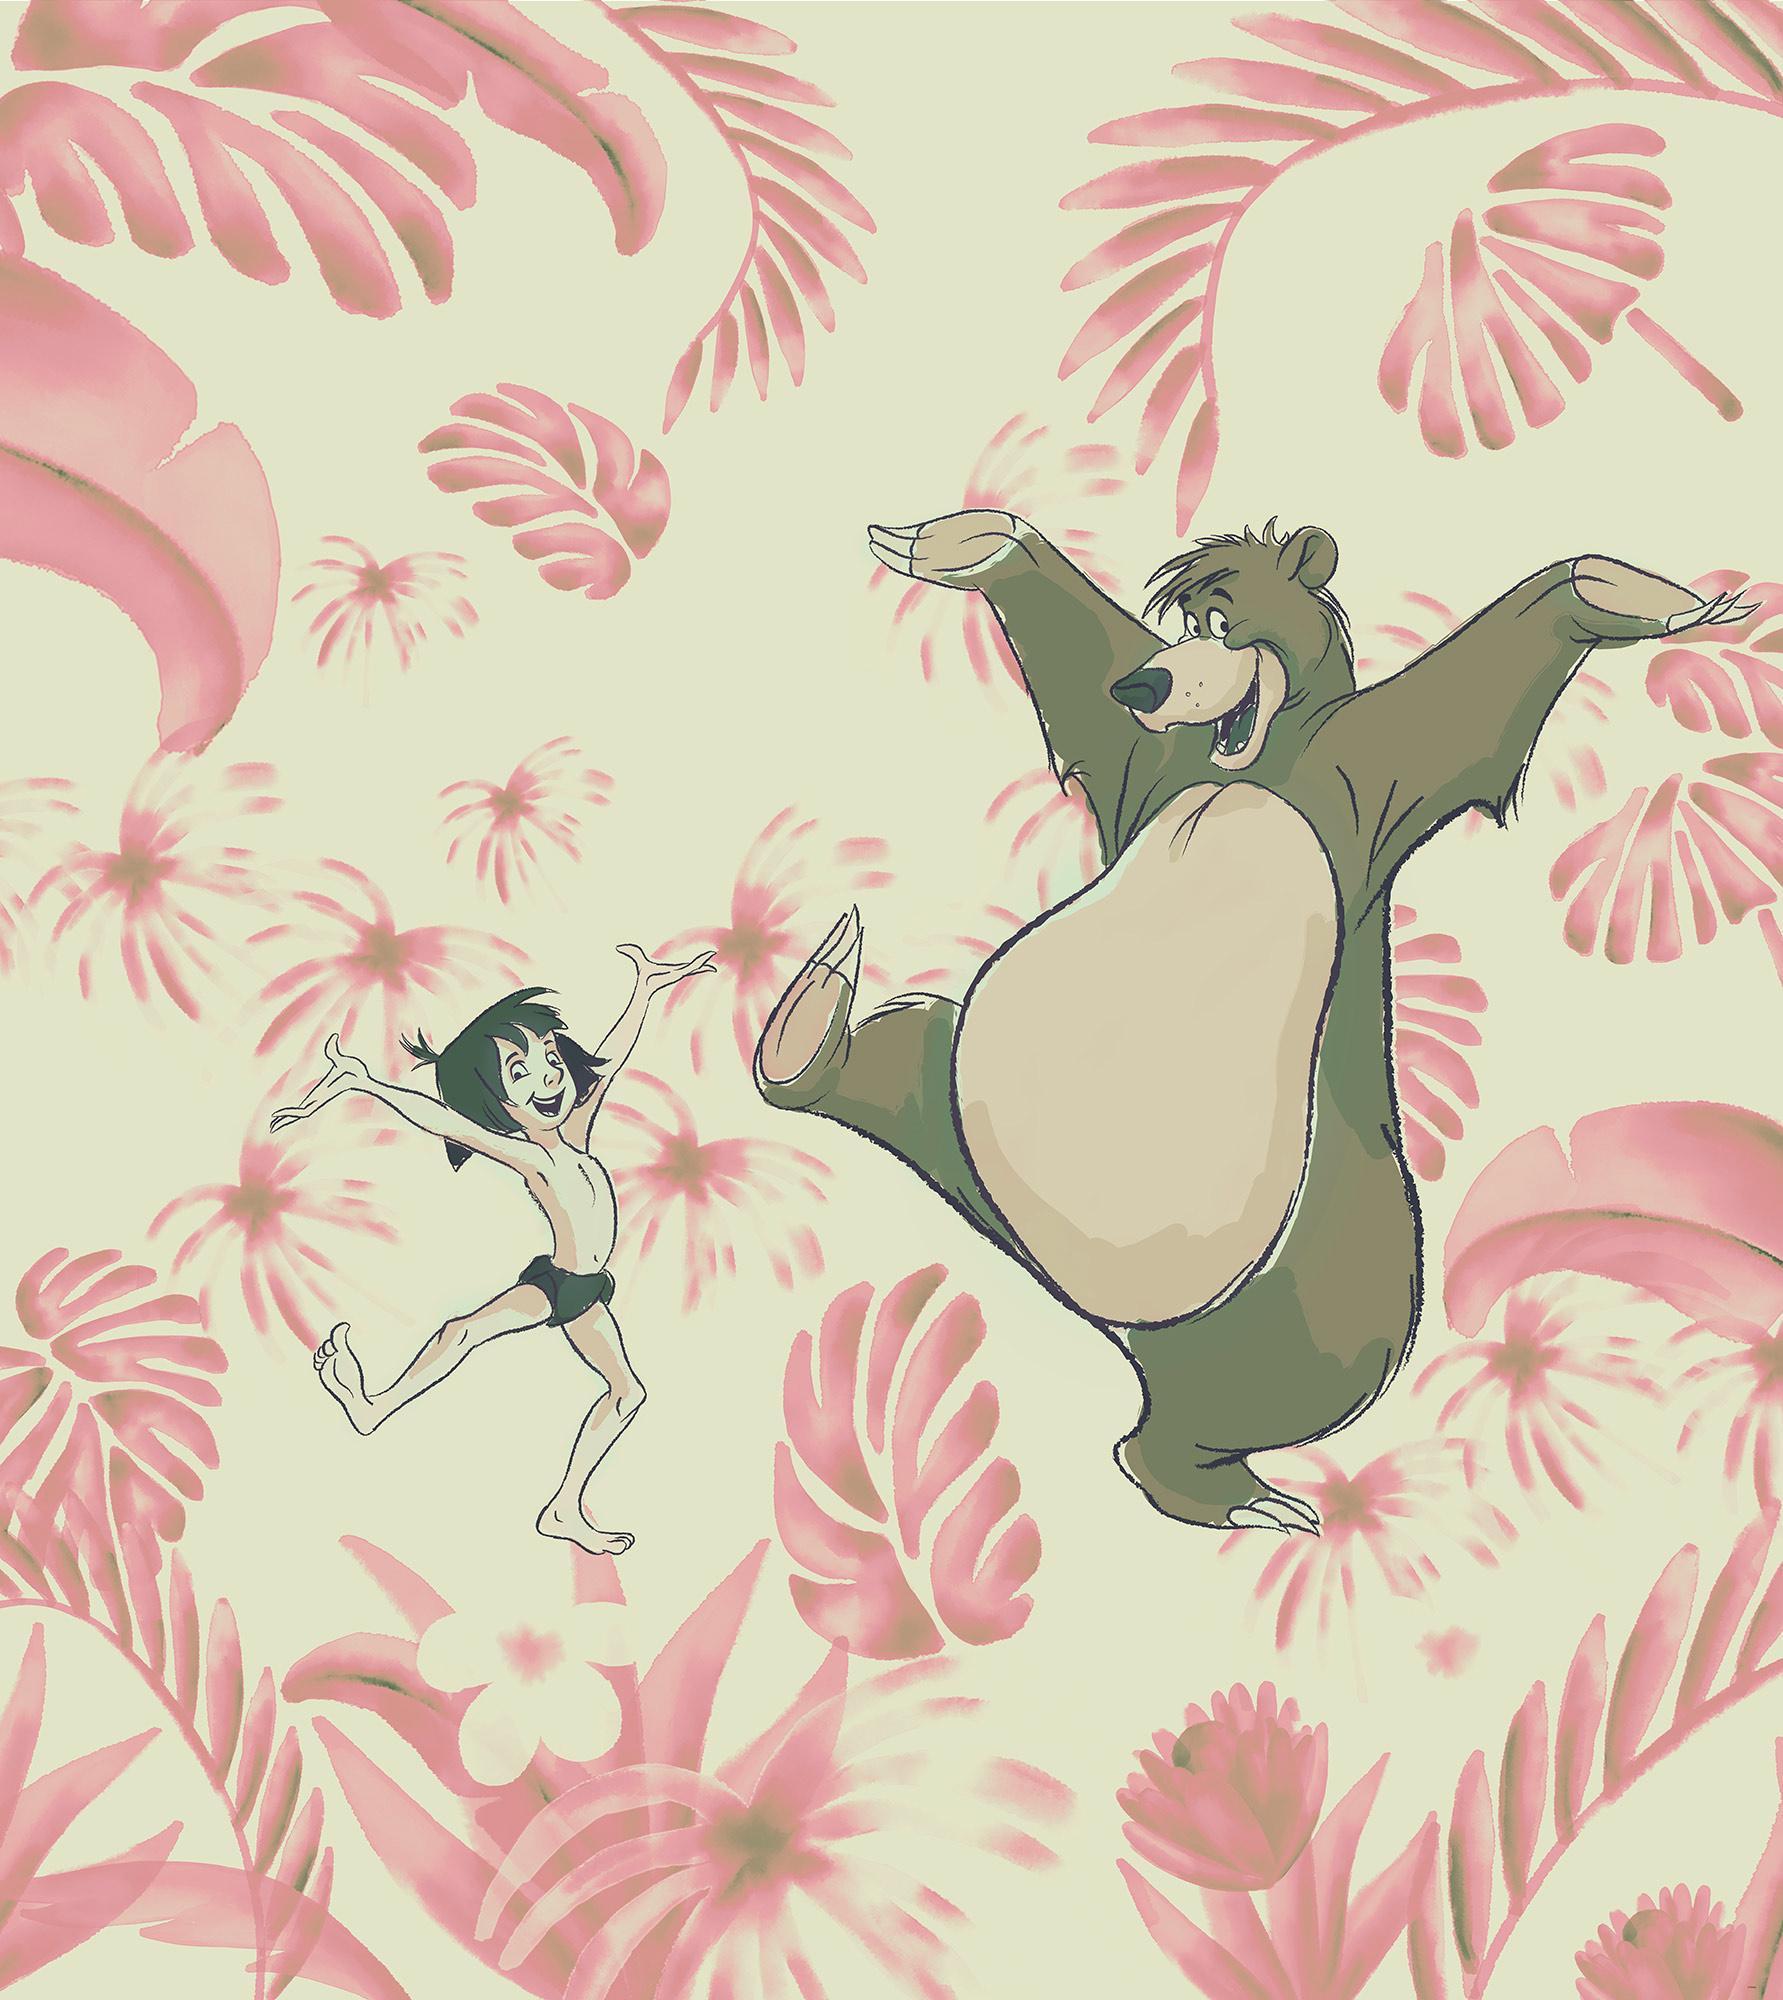 Disney Edition 4 Kinderbehang Komar - Kinderkamer behang Dance the Jungle